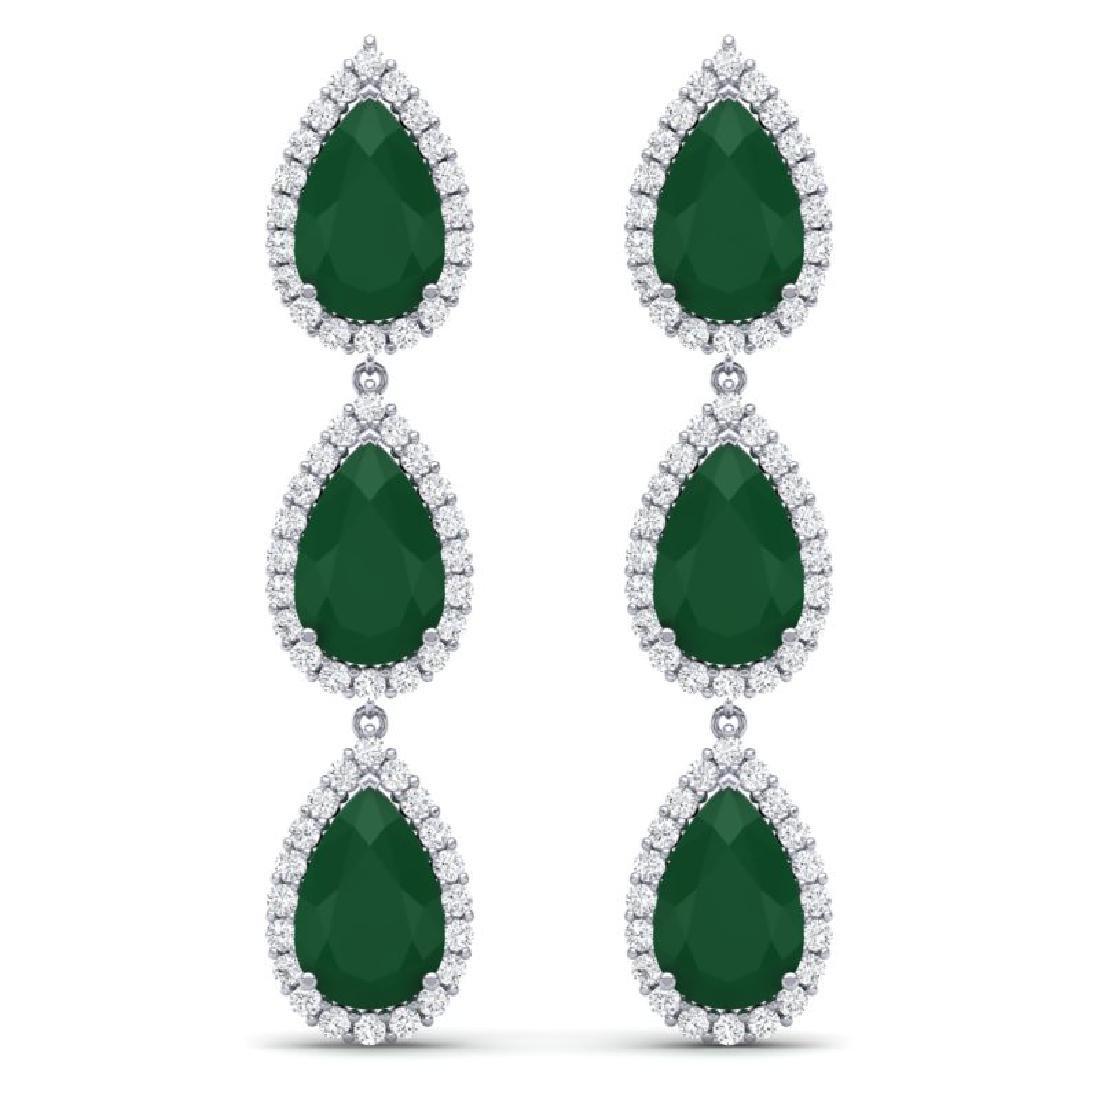 27.06 CTW Royalty Emerald & VS Diamond Earrings 18K